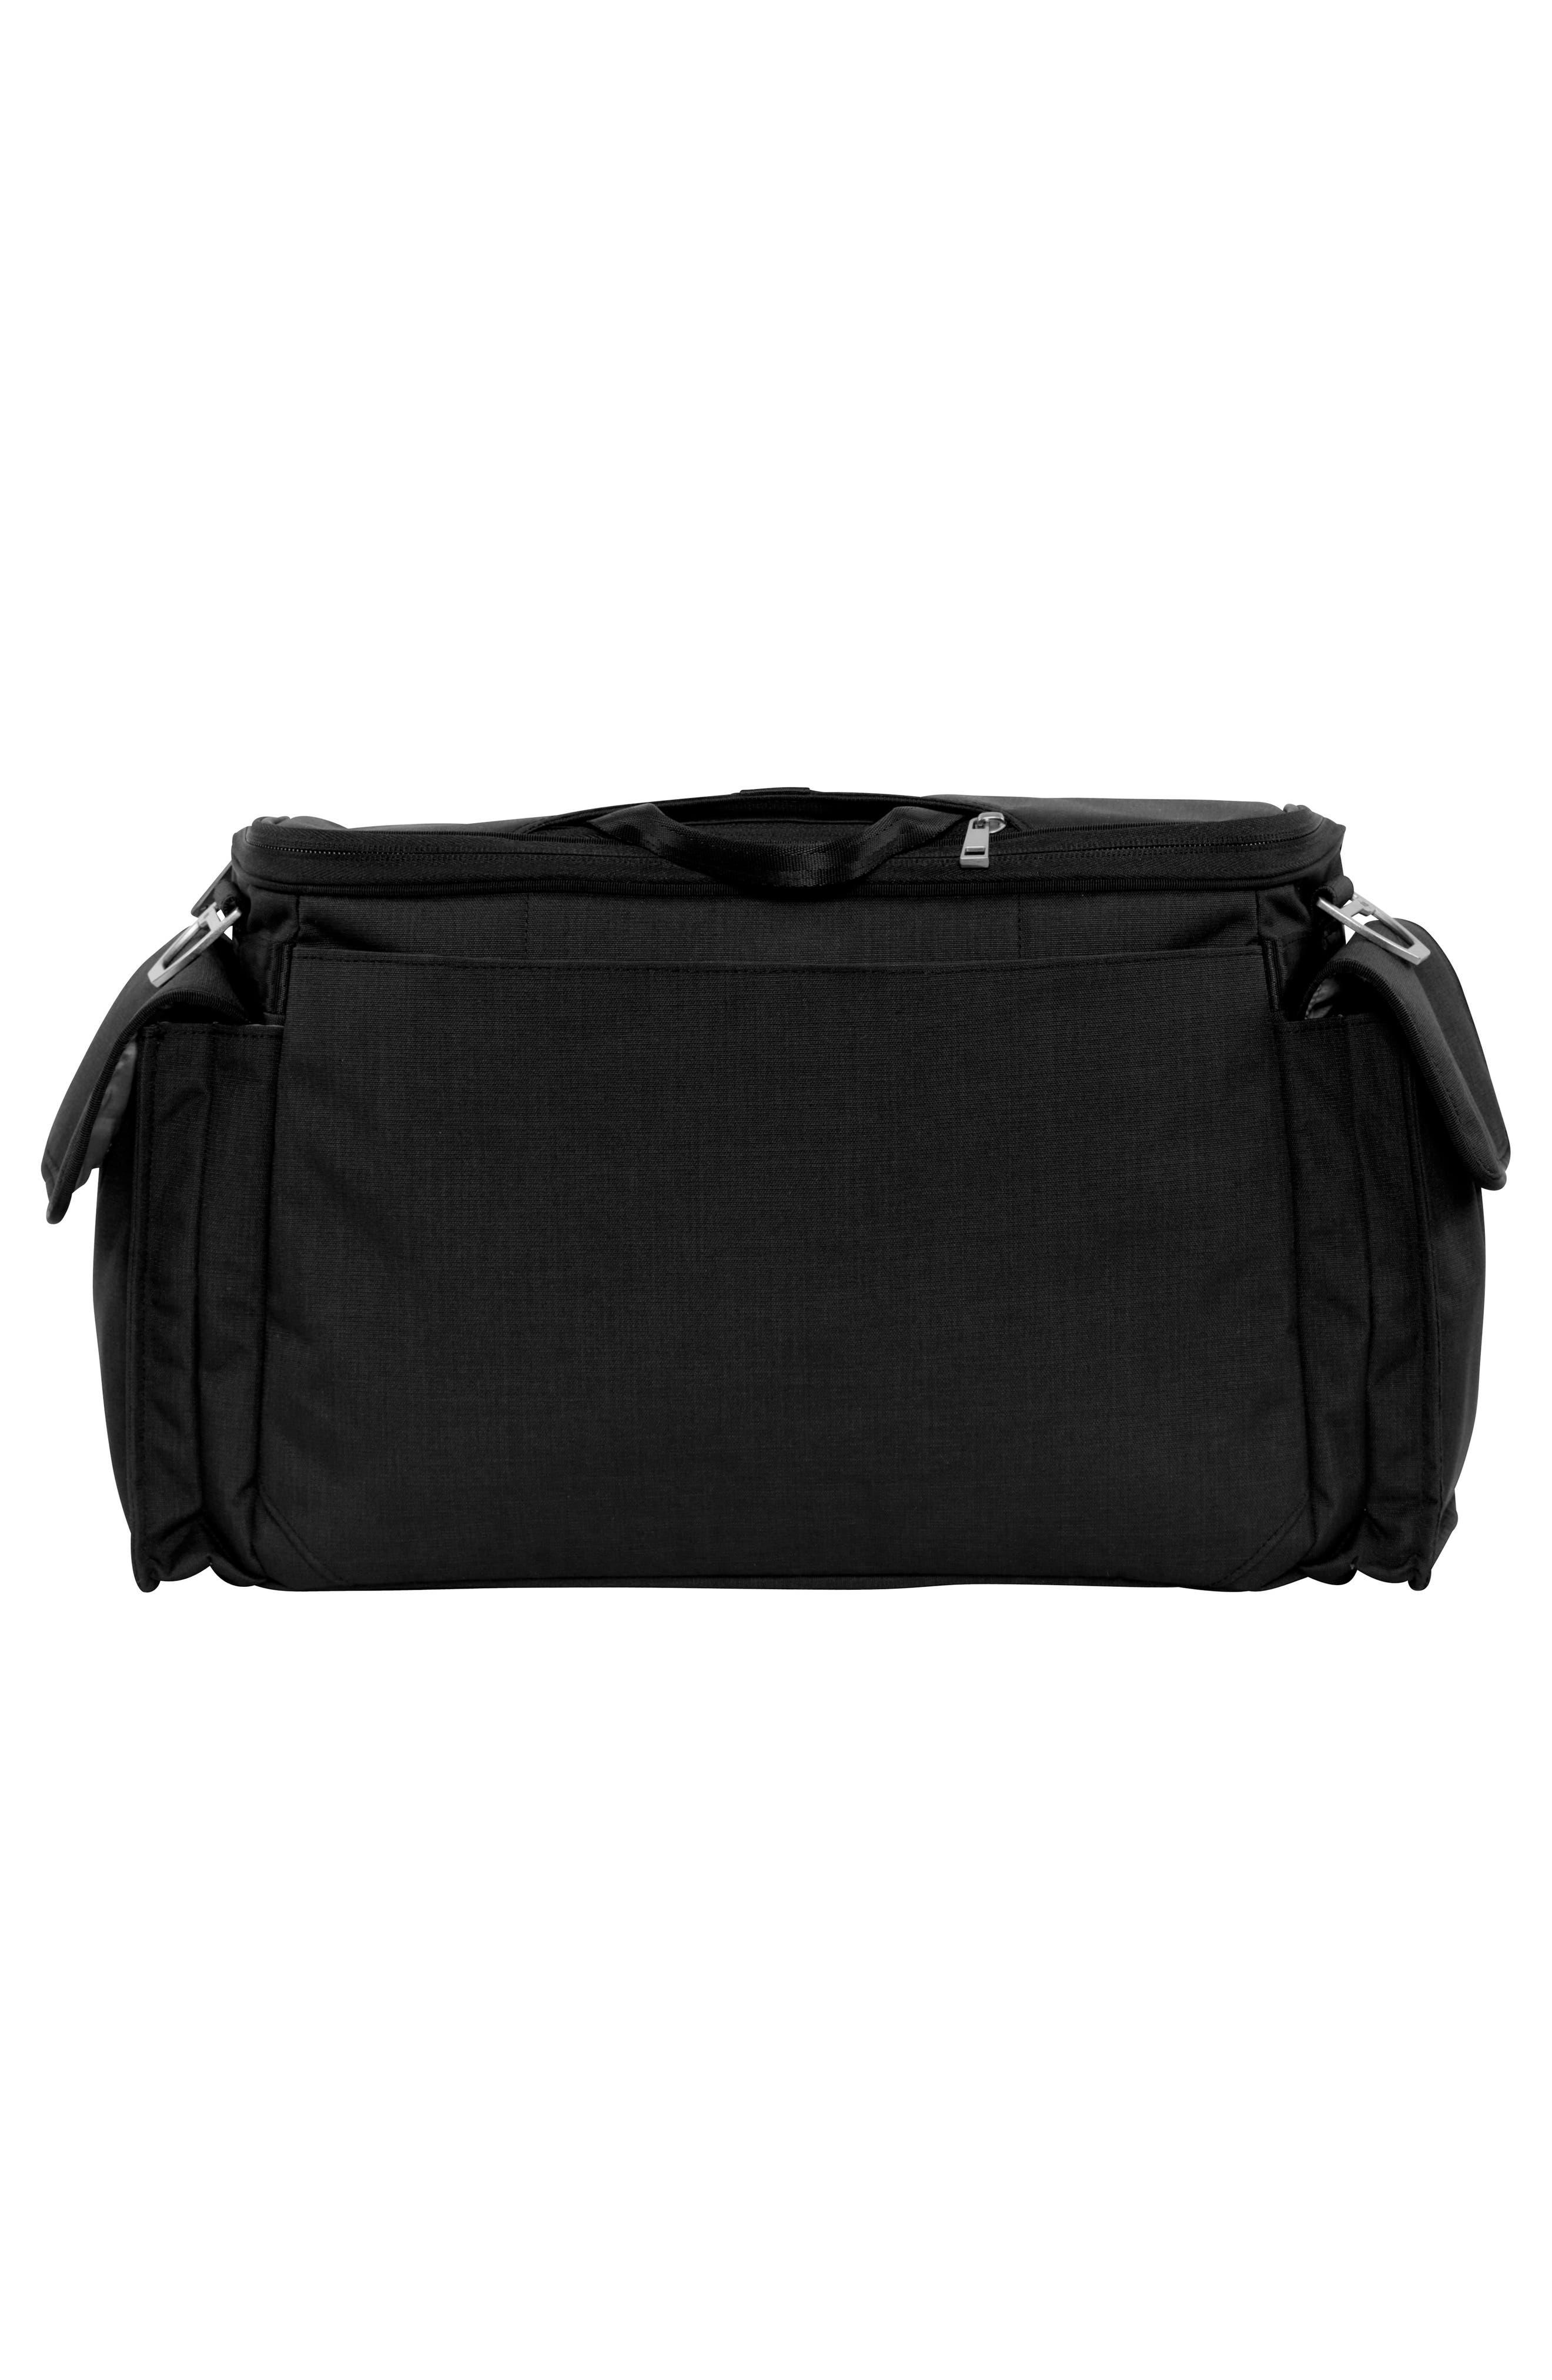 XY Clone Diaper Bag,                             Alternate thumbnail 2, color,                             CARBON